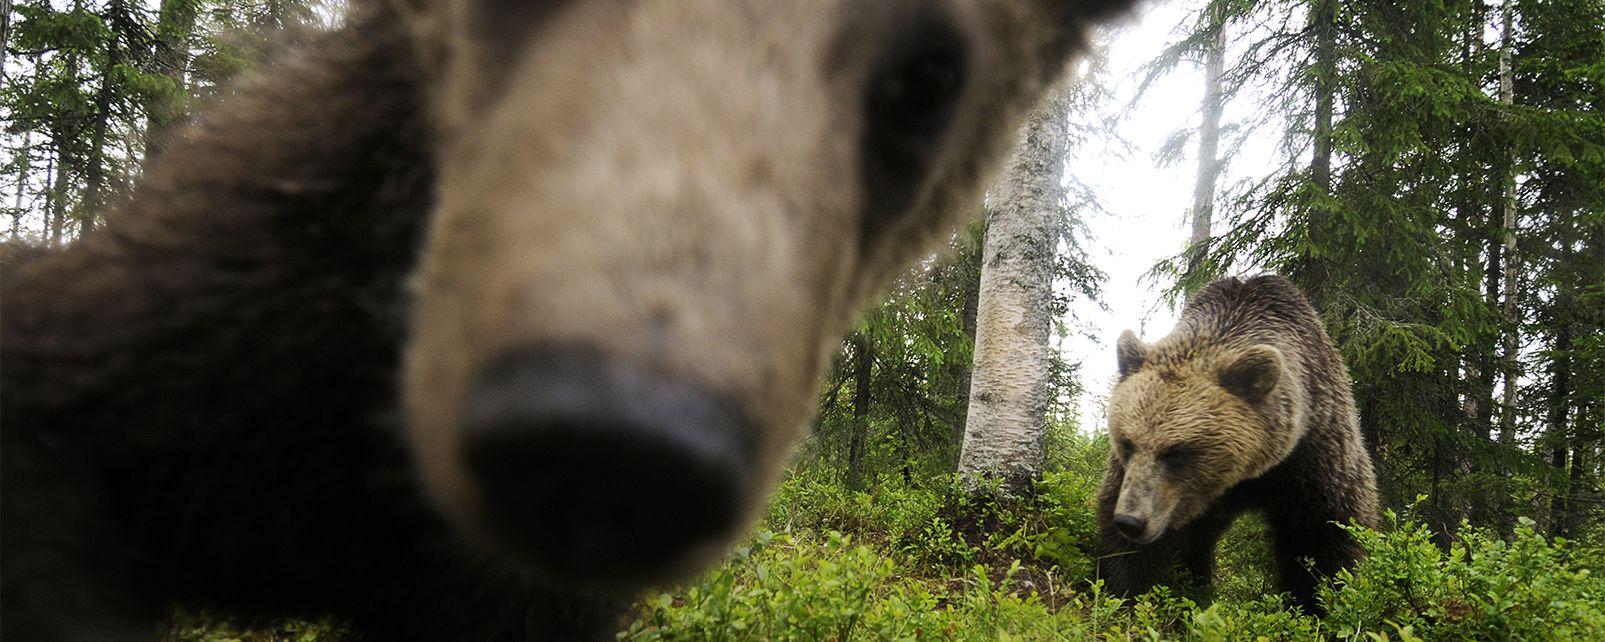 Observer les ours , Ours Brun , Finlande